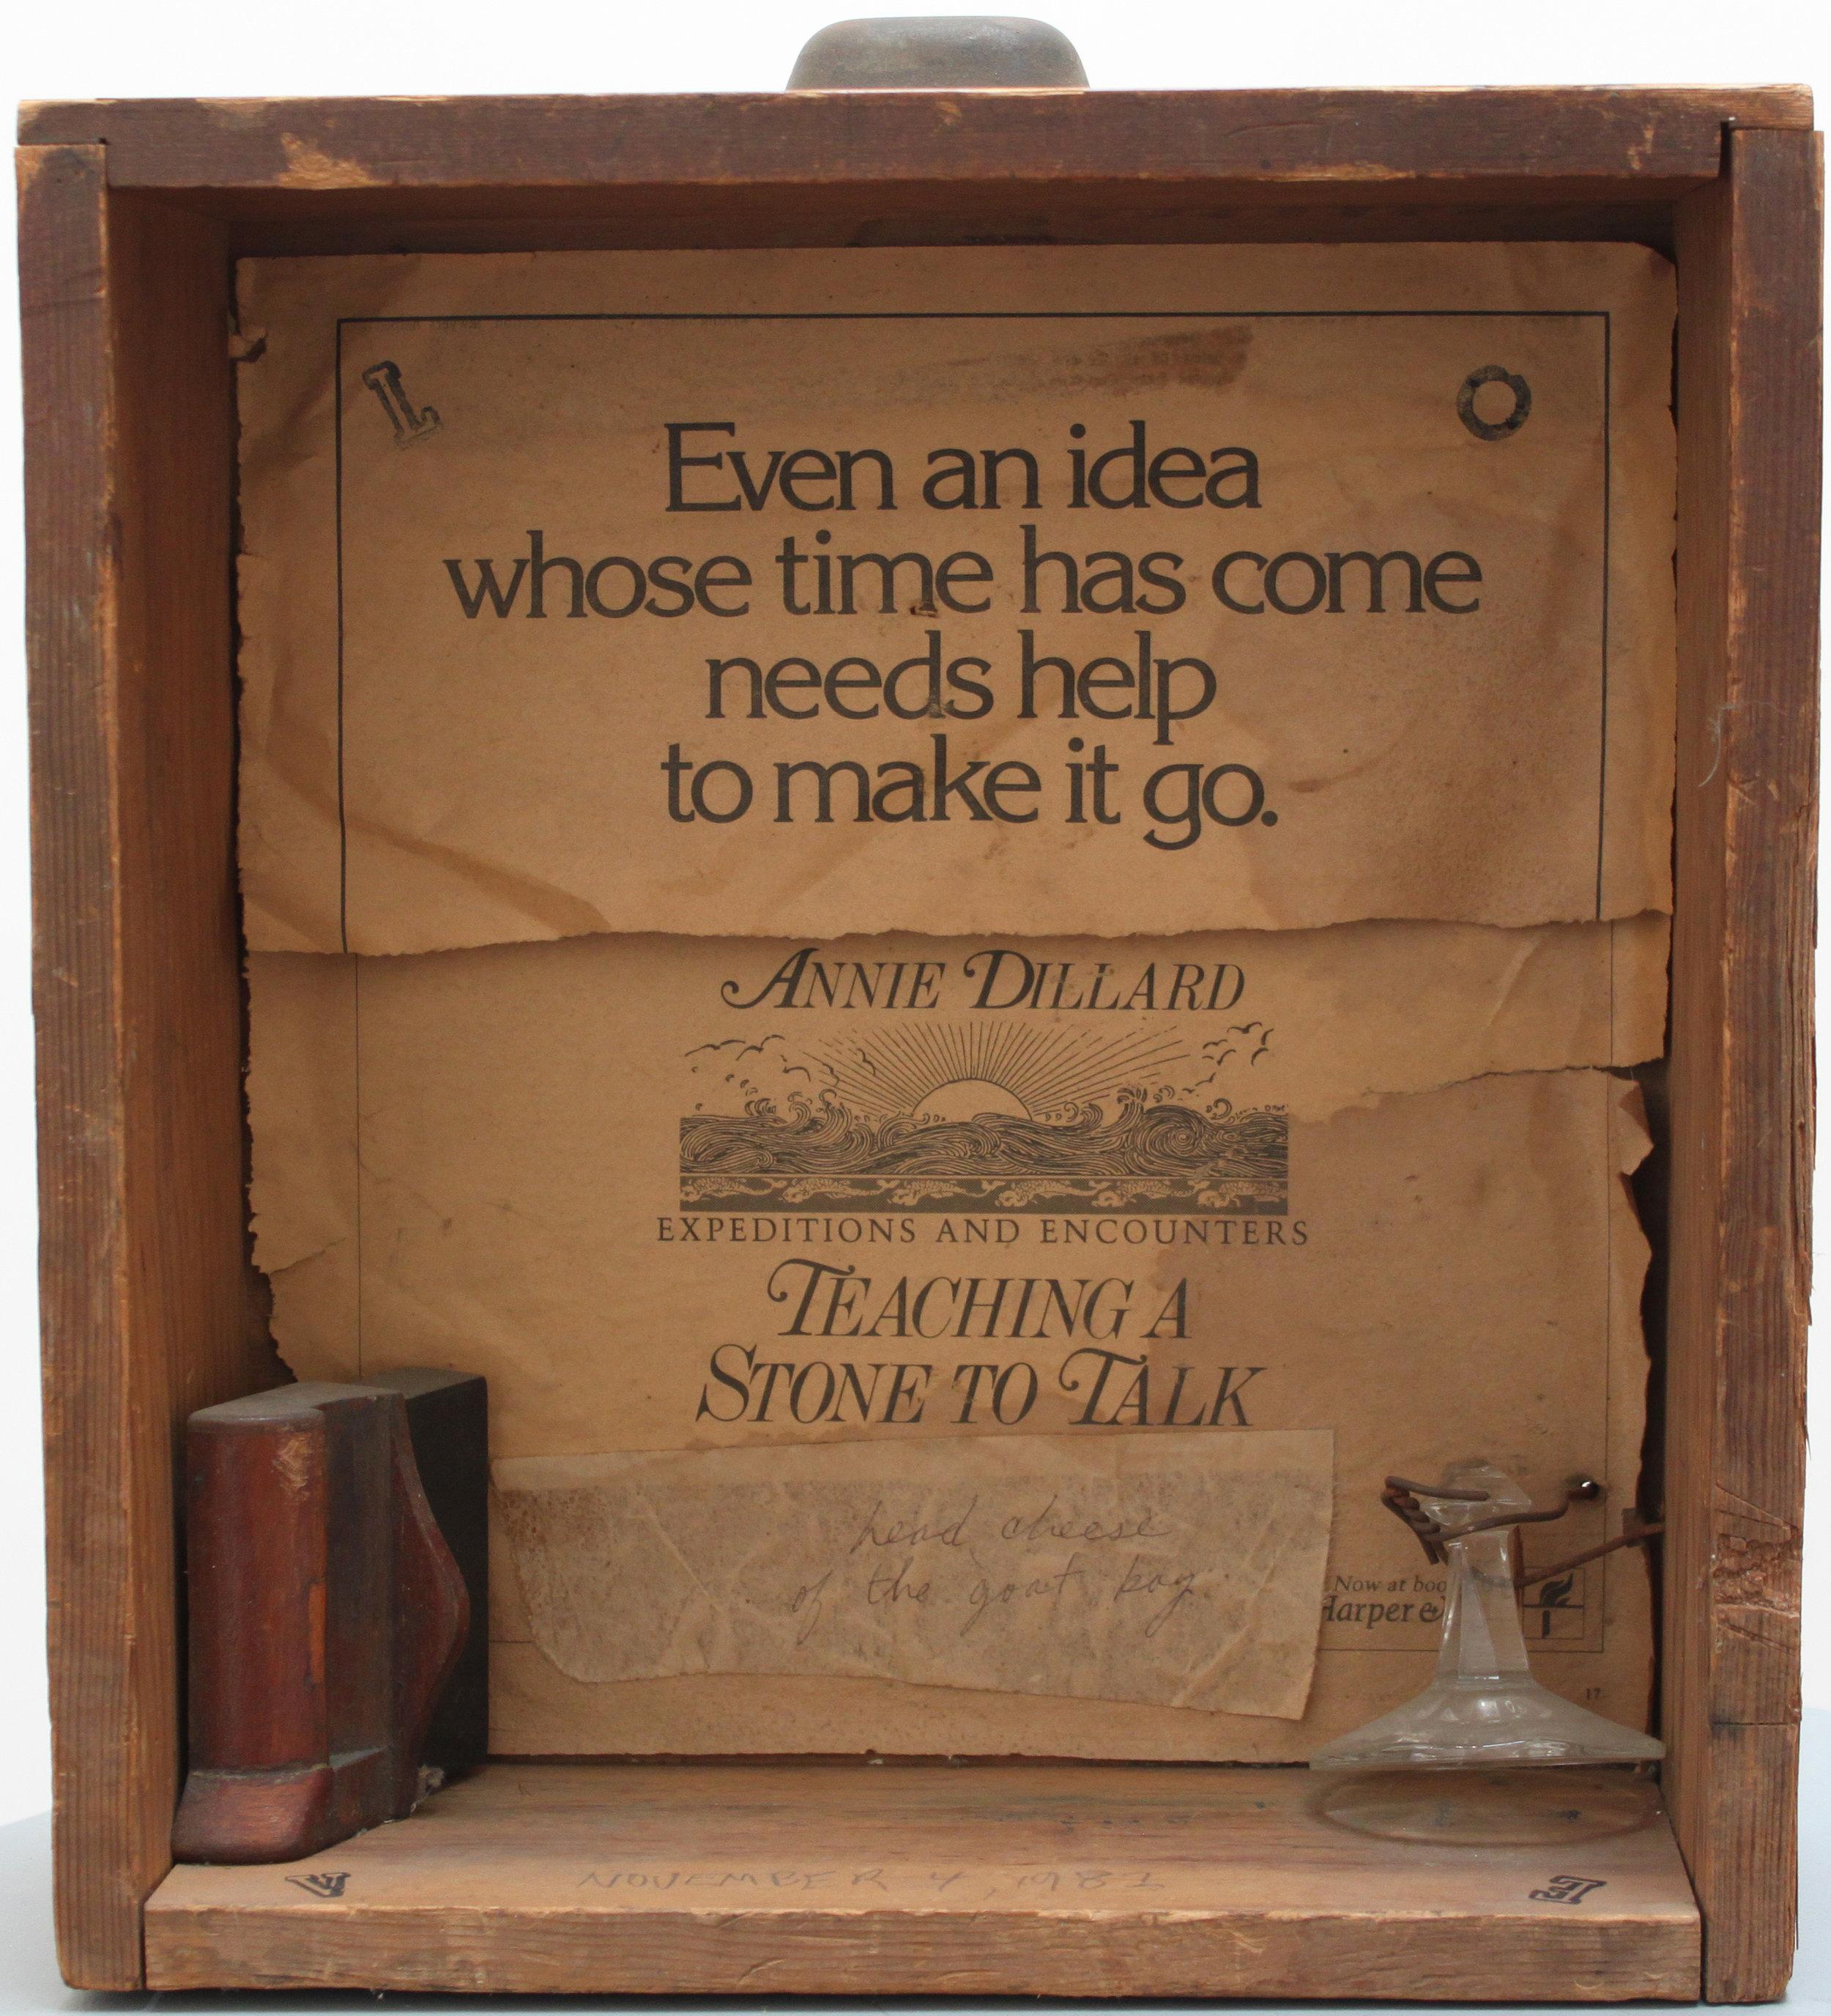 Teaching a Stone to Talk for Annie (Dillard) , 1982  mixed media 13 1/2 x 12 1/4 x 5 inches; 34.3 x 31.1 x 12.7 centimeters